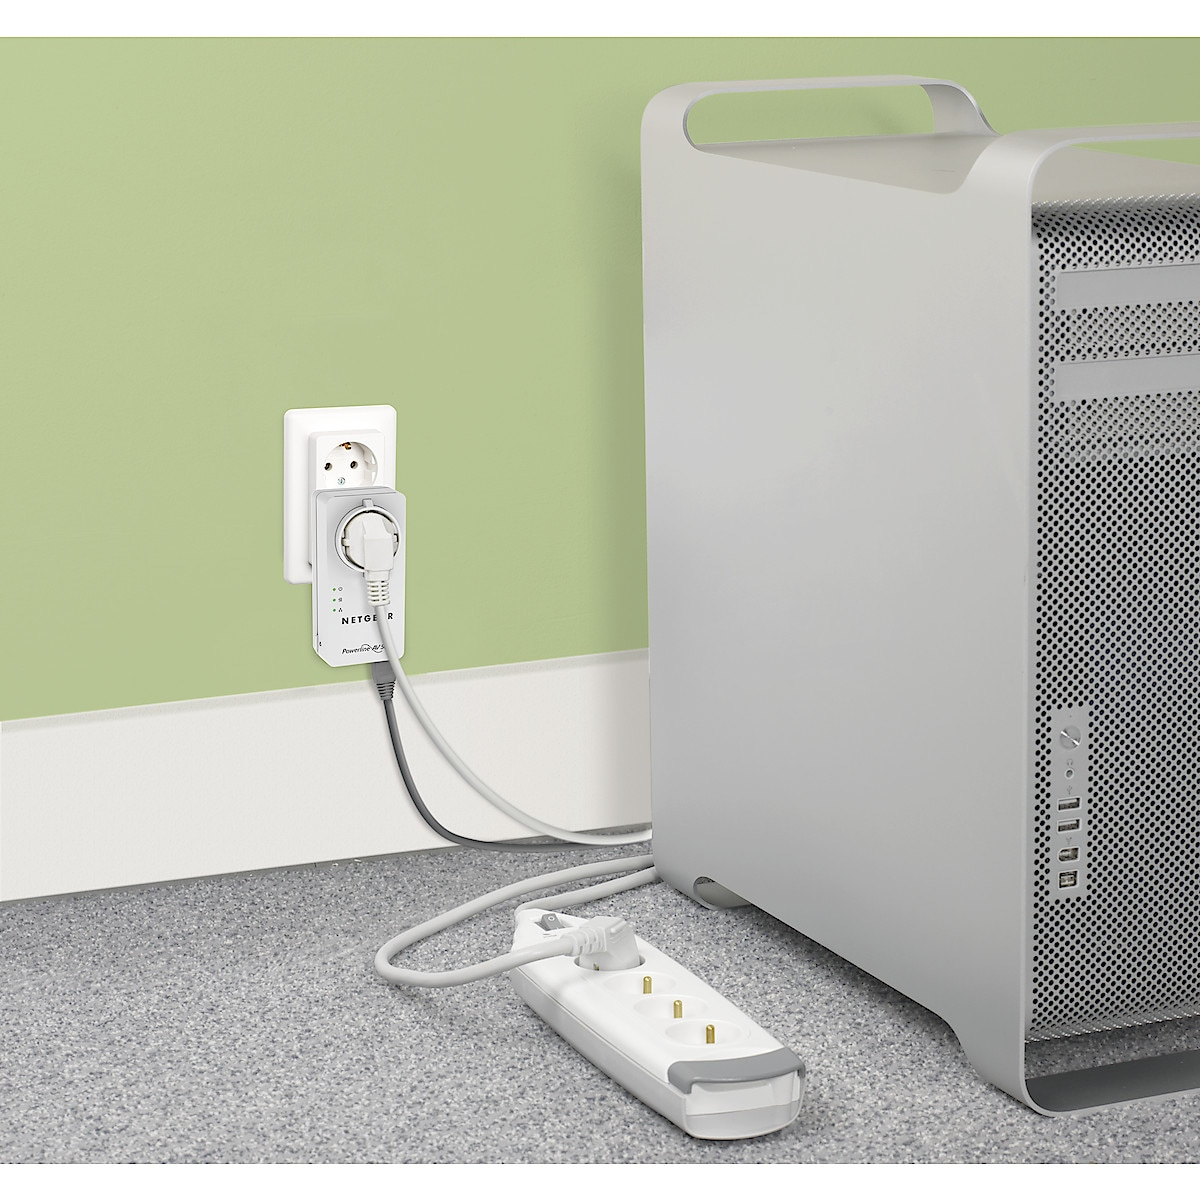 Netgear HomePlug  XAVB5401